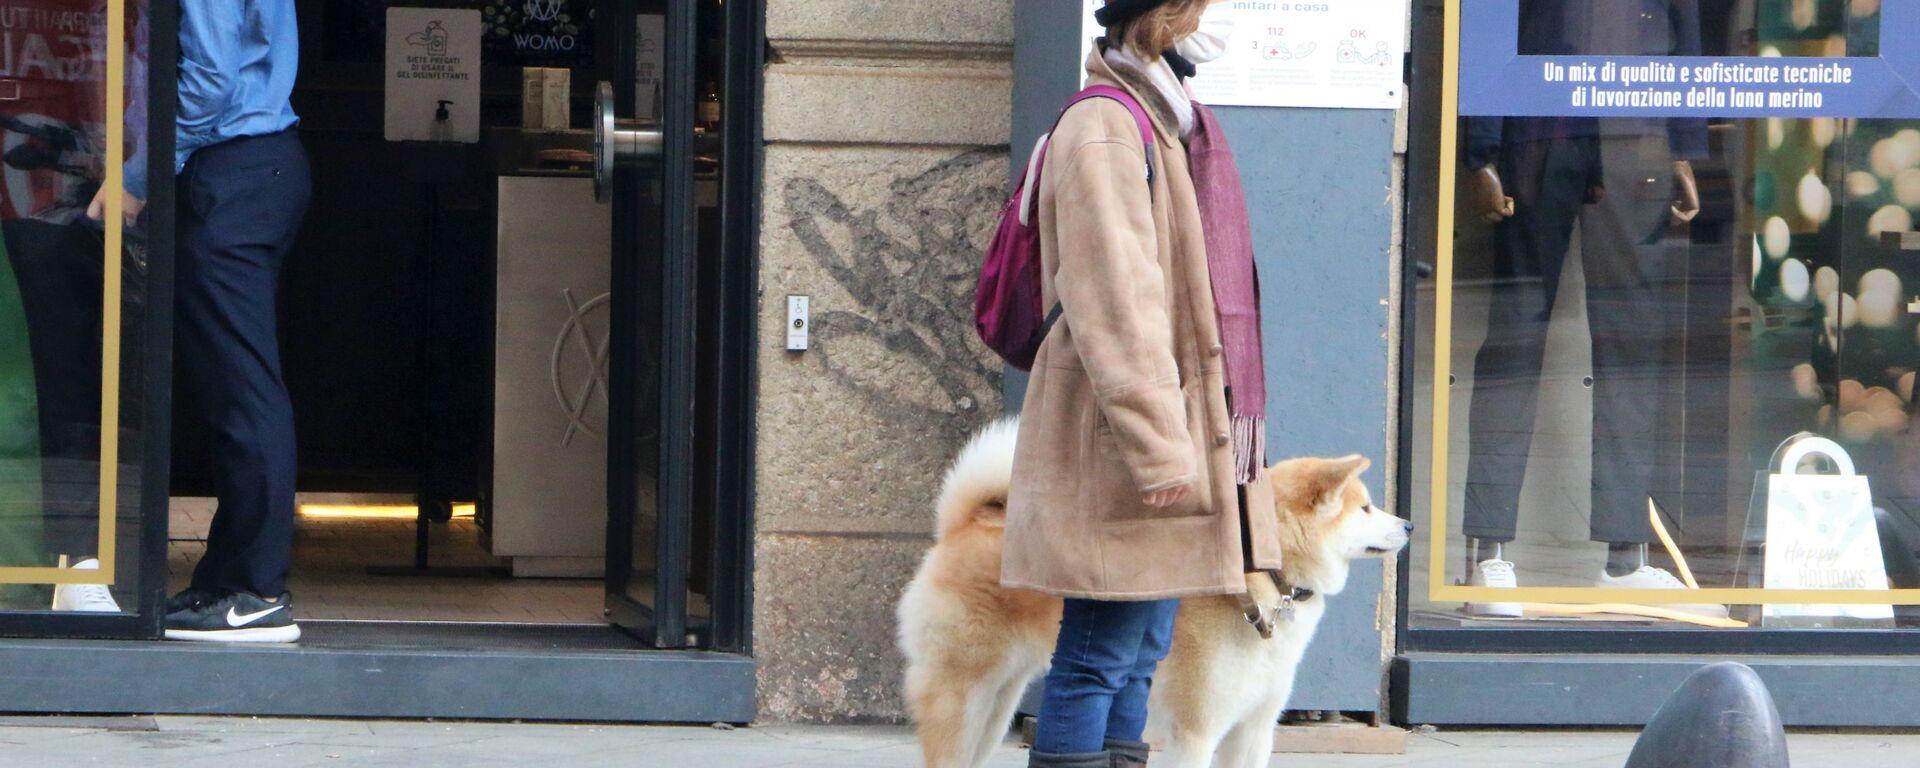 Una donna in mascherina con un cane - Sputnik Italia, 1920, 02.04.2021